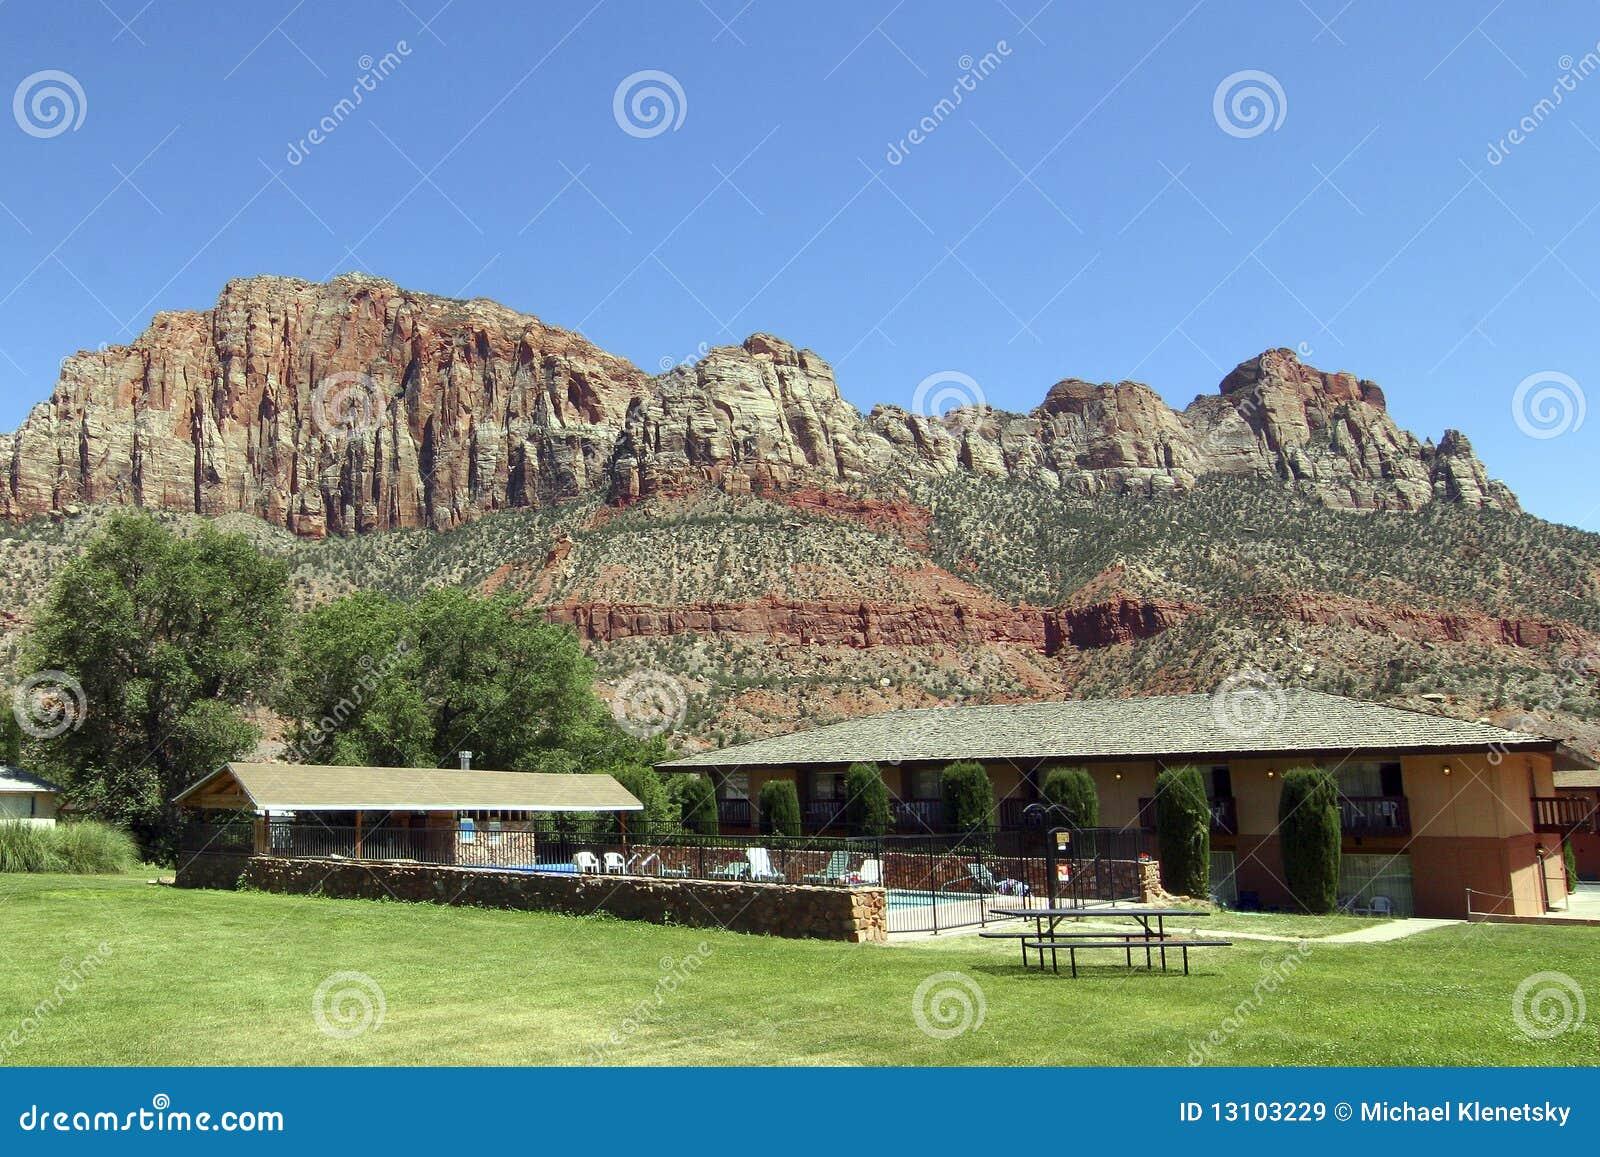 Rural Motel